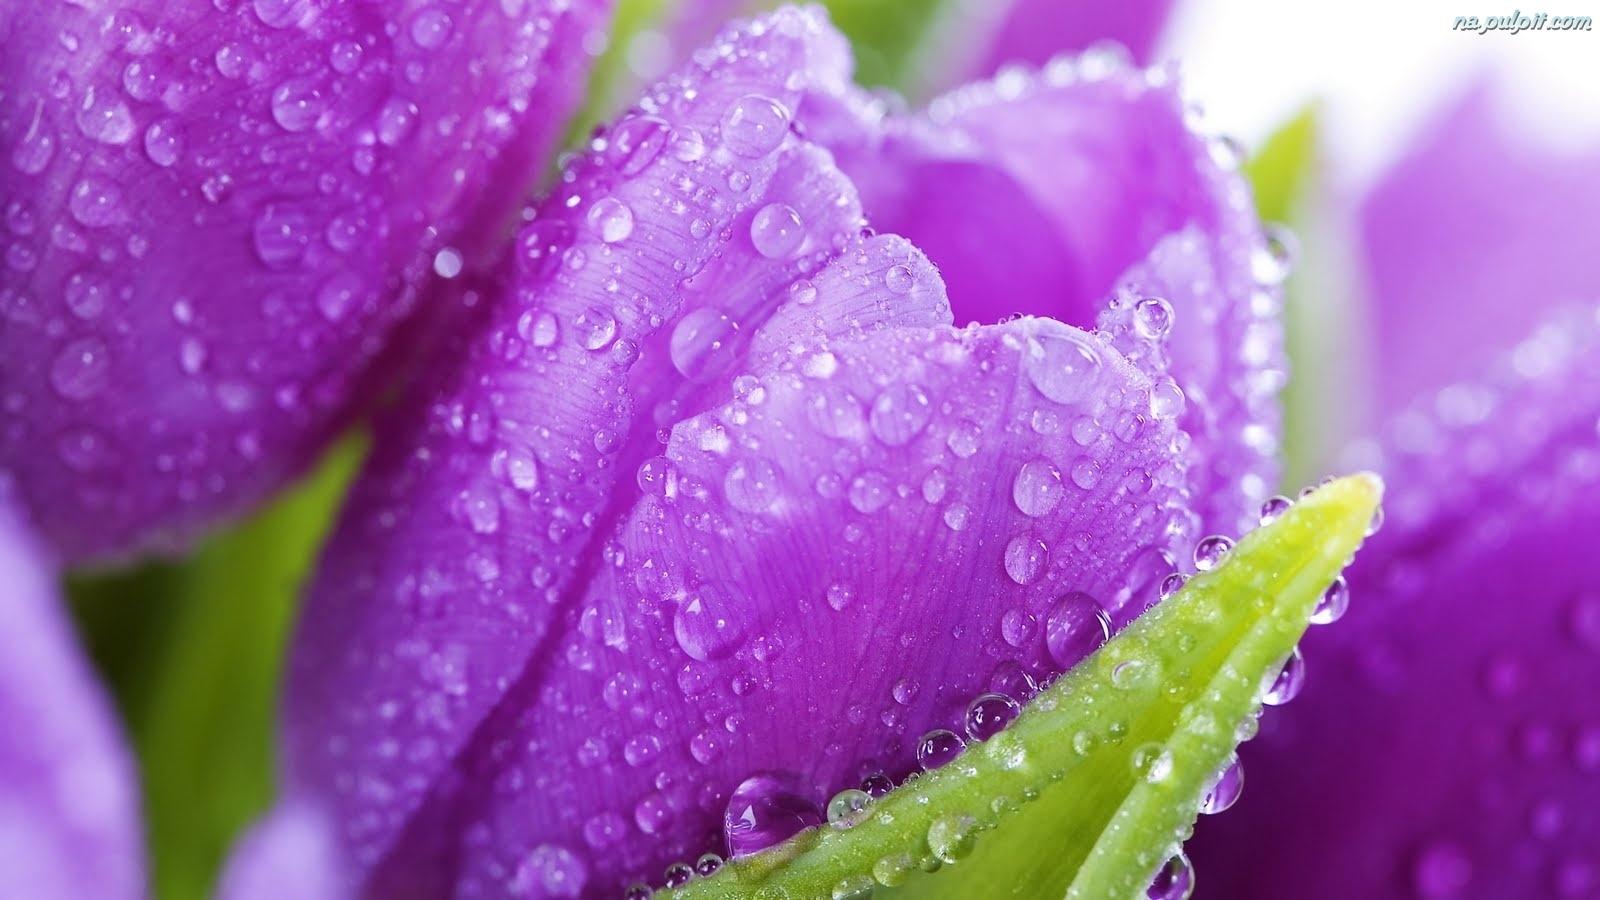 ... tulipany-krople.na-pulpit.com/zdjecia/wody-fioletowe-tulipany-krople